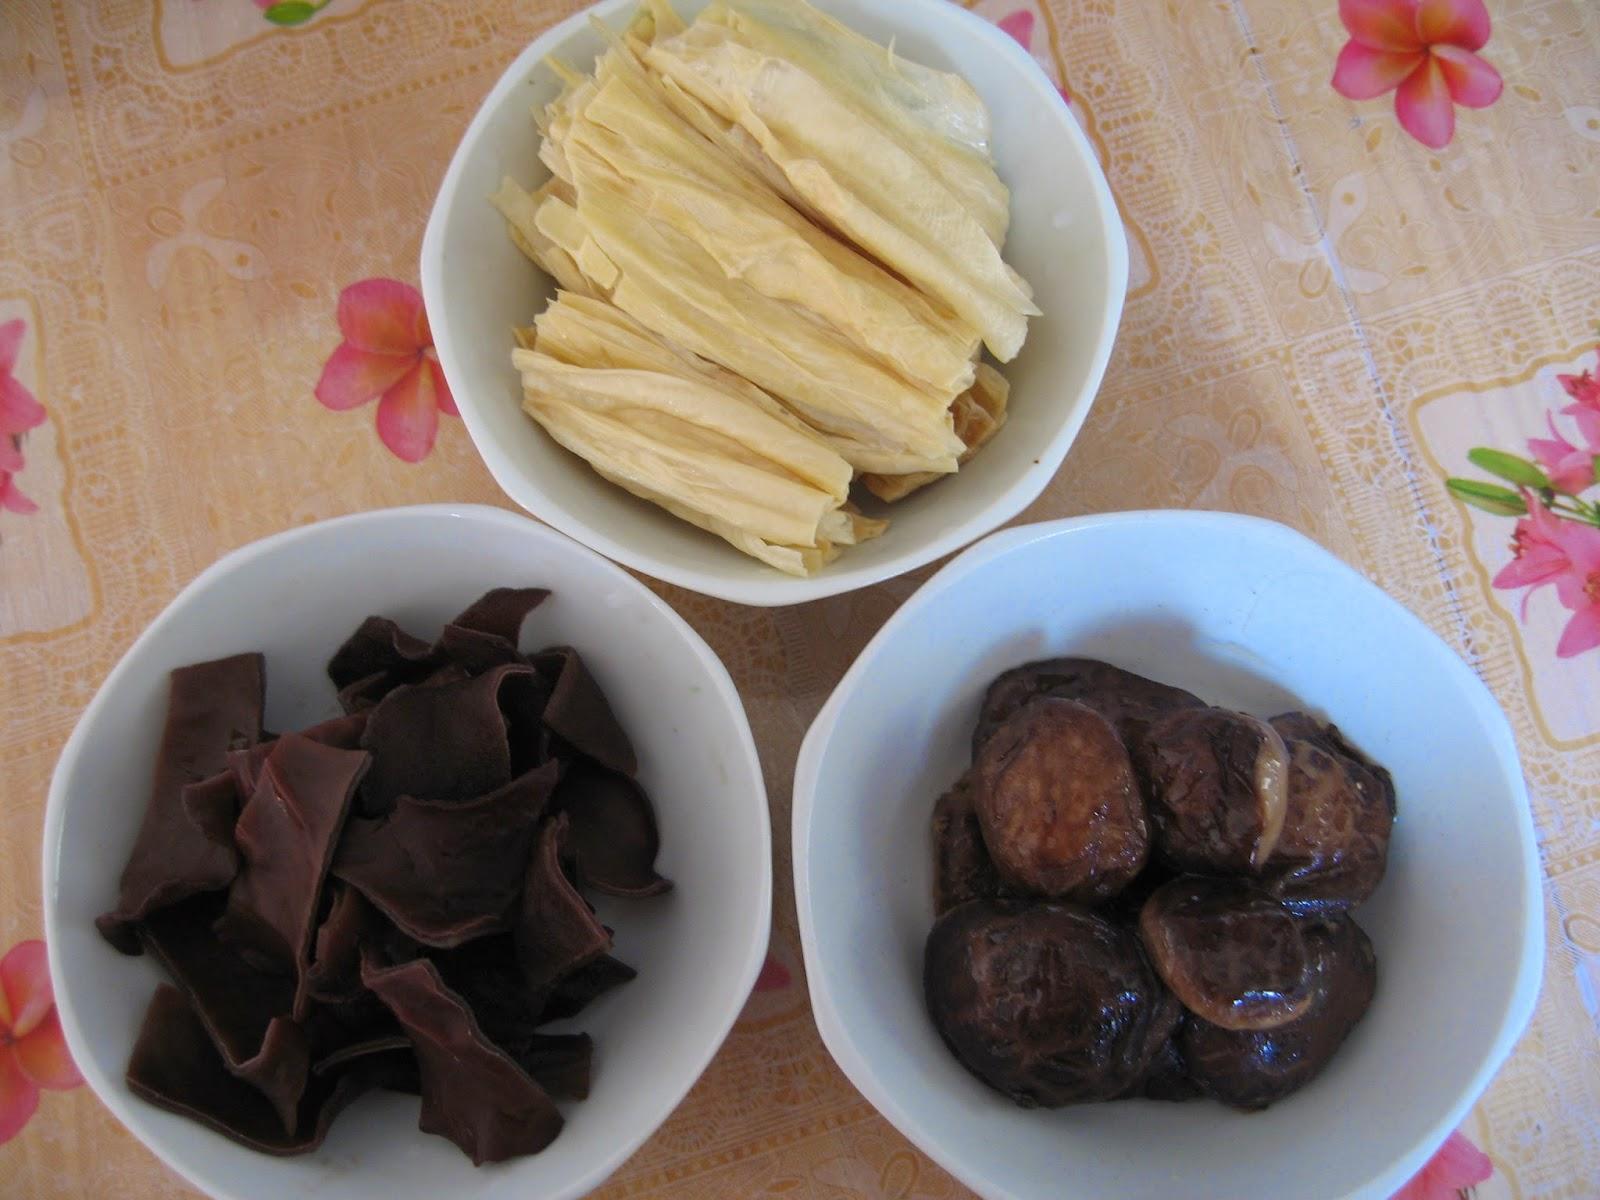 Sumptuous Flavours Vegetarian Bak Kut Teh 斋肉骨茶